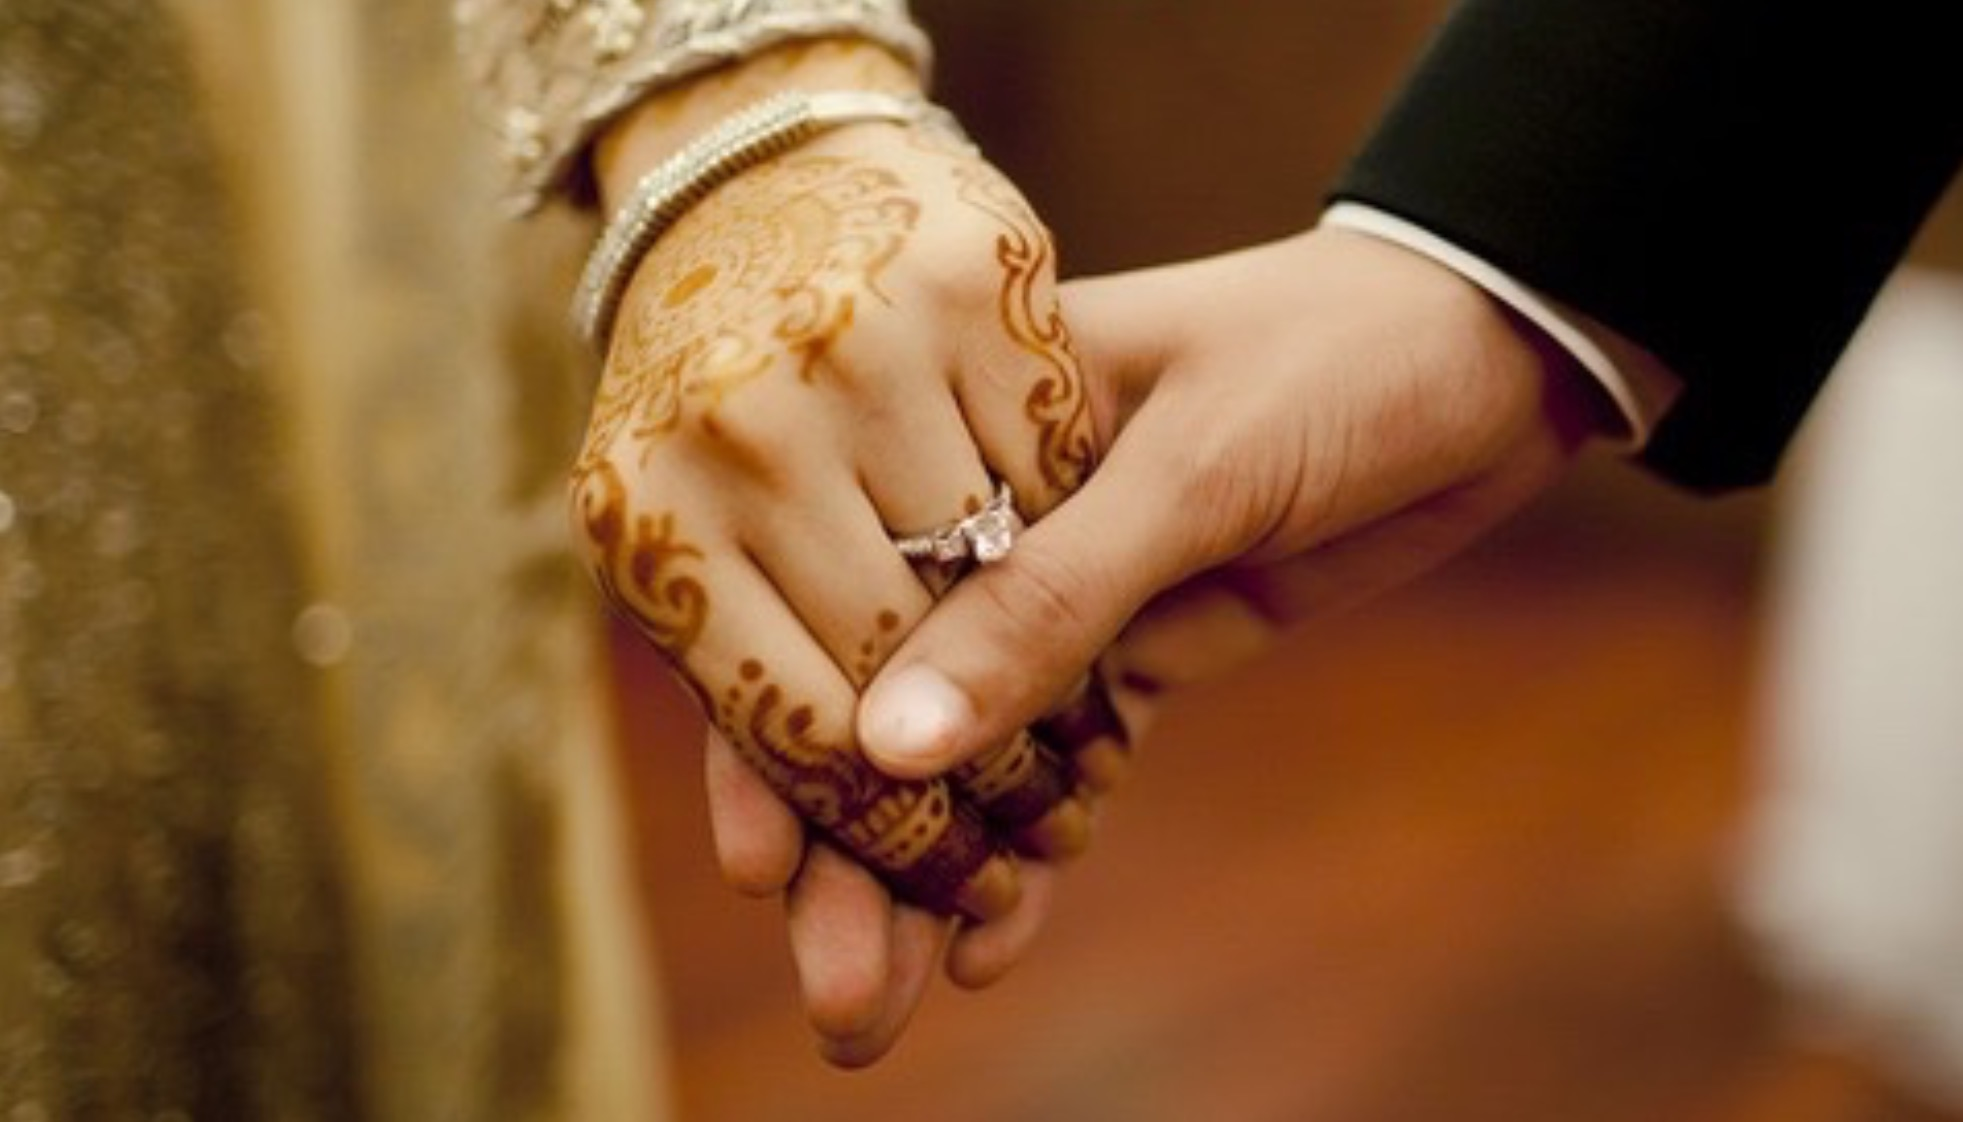 Looking marriage girl moroccan for Moroccan Bride